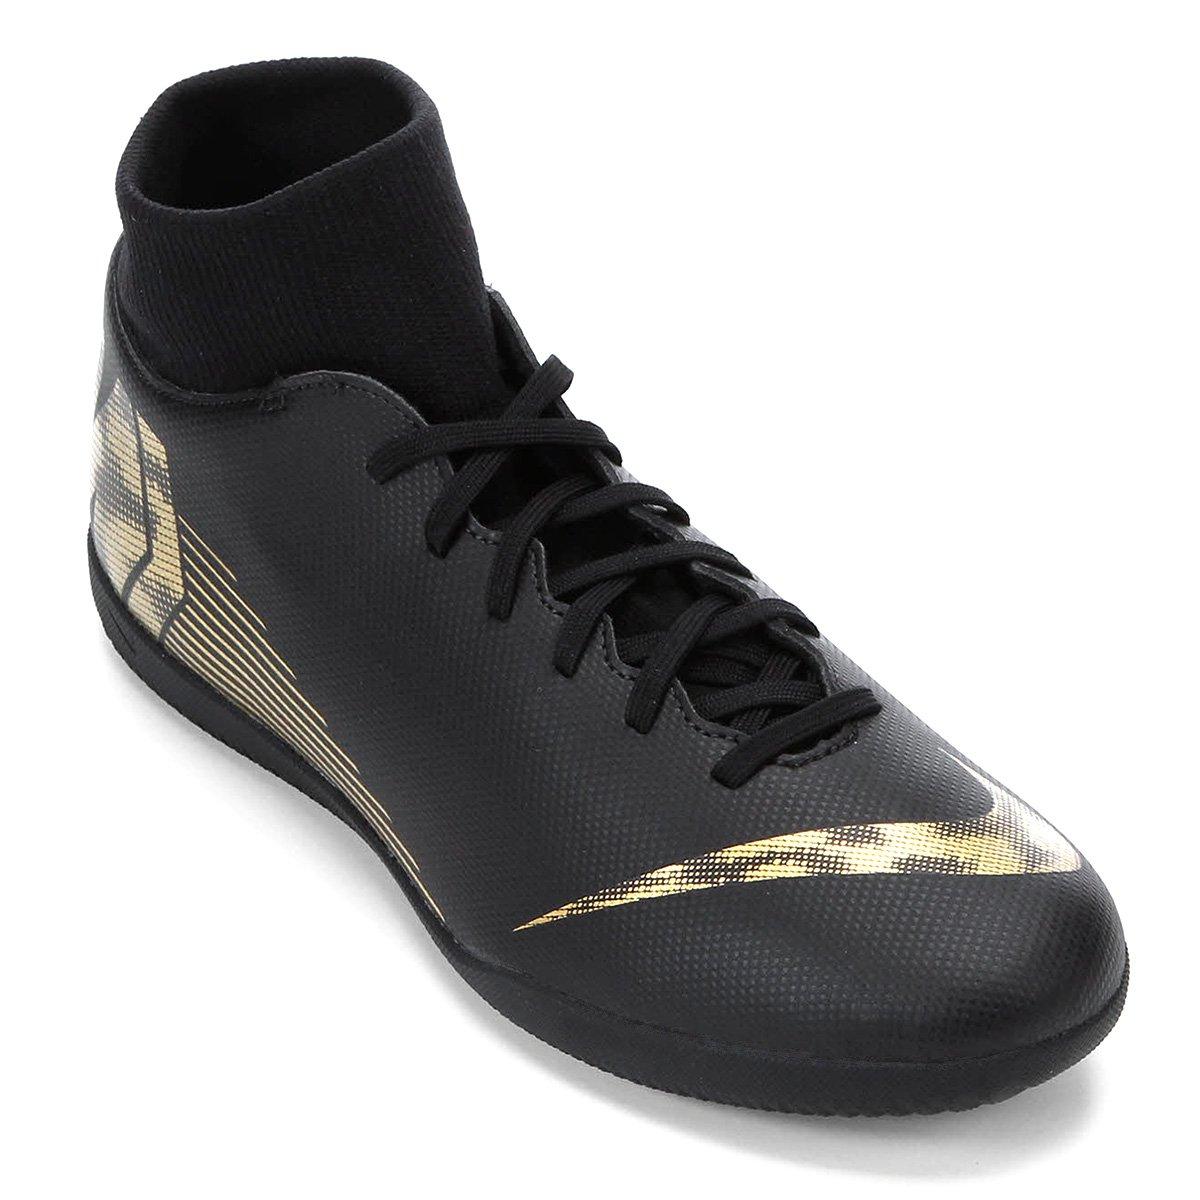 e0357288e3 Chuteira Futsal Nike Mercurial Superfly 6 Club - Preto e Dourado ...